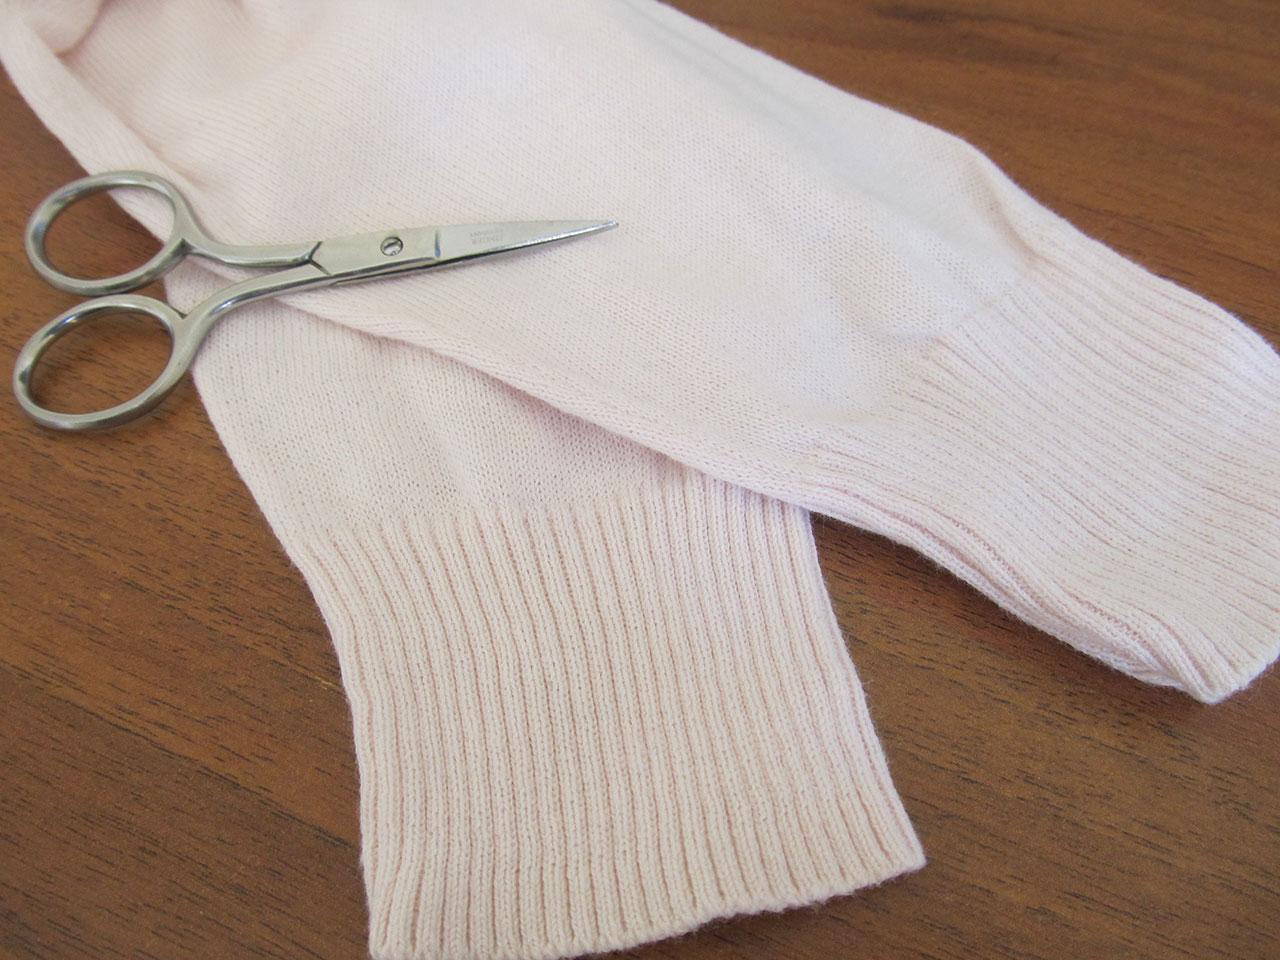 Митенки-варежки из старого свитера